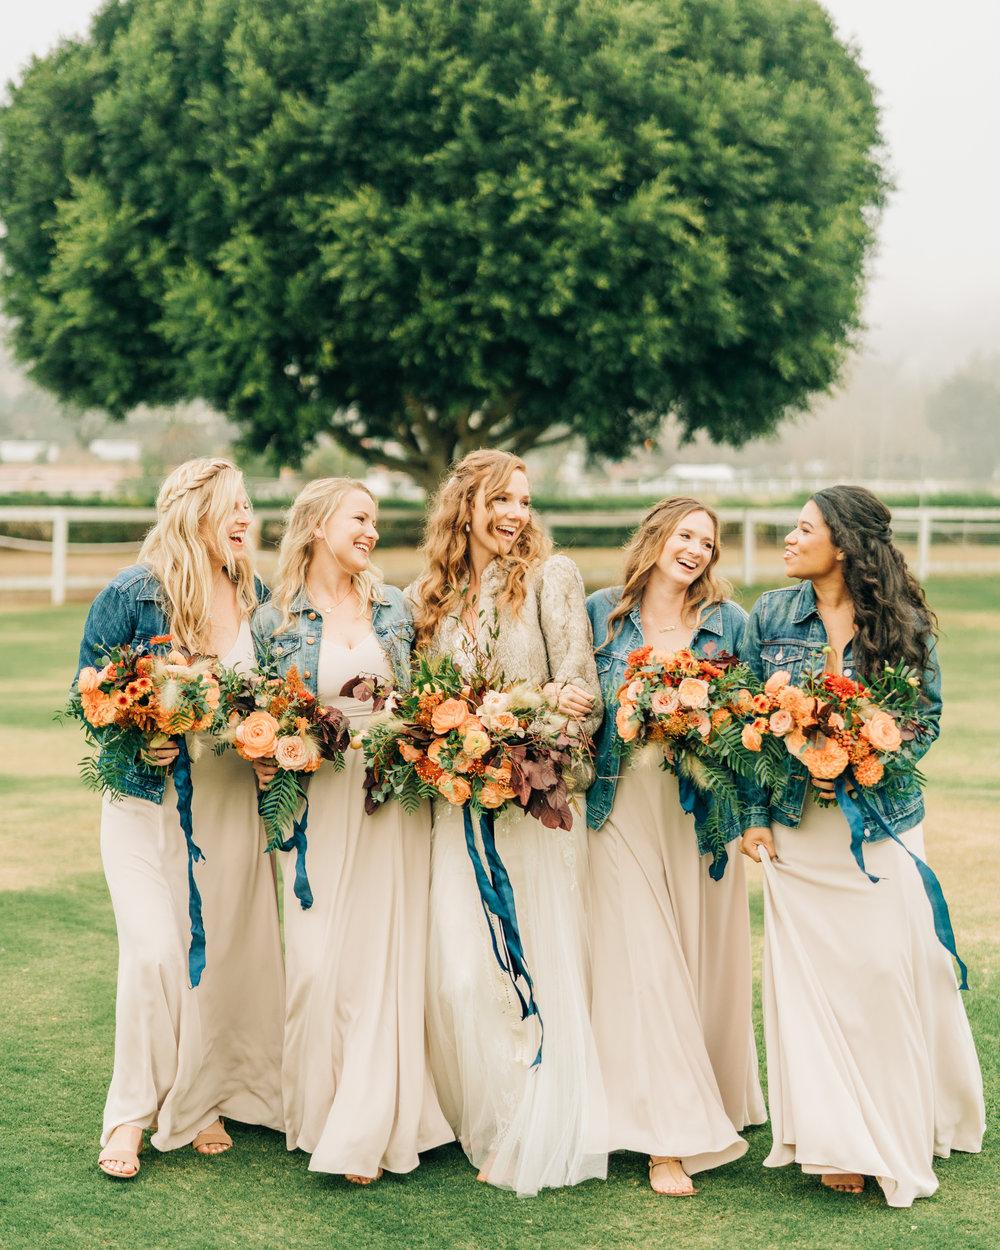 allie-shupe-tyler-wiggins-wedding-santa-barbara 184.jpg